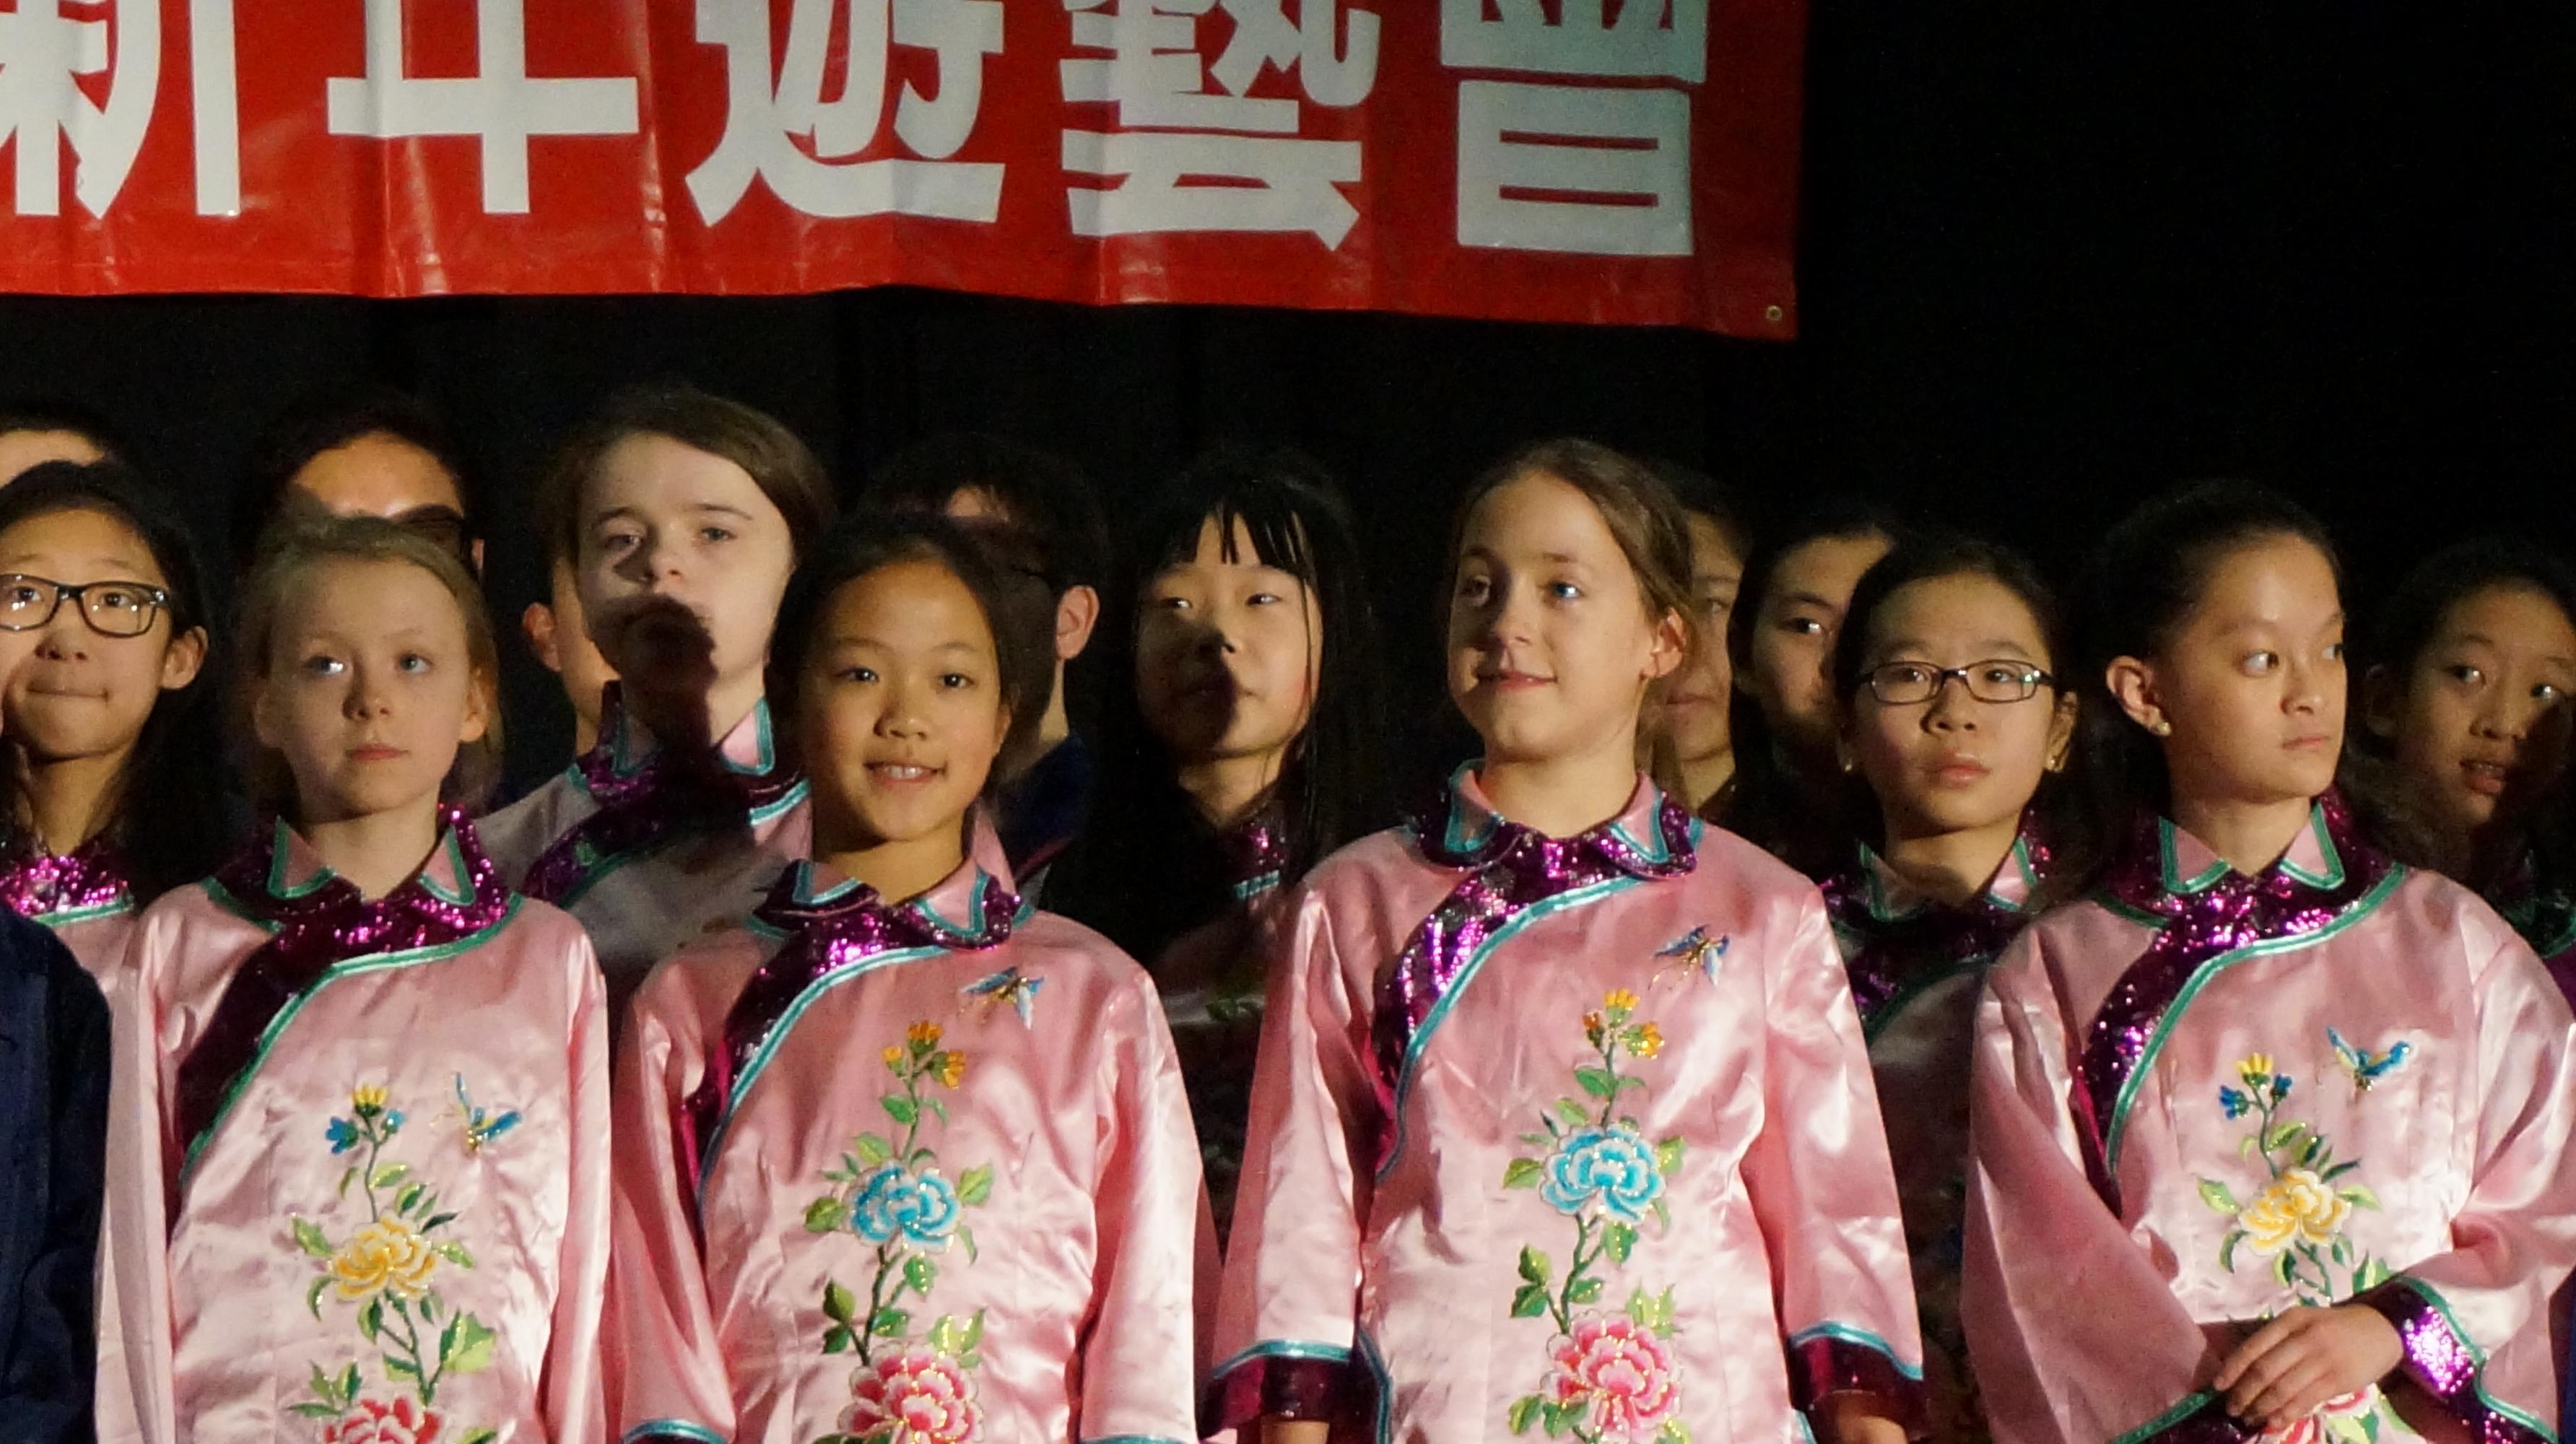 0e305ef62d1cd4396c86_aaa_Chinese_New_Year_pix_444.JPG